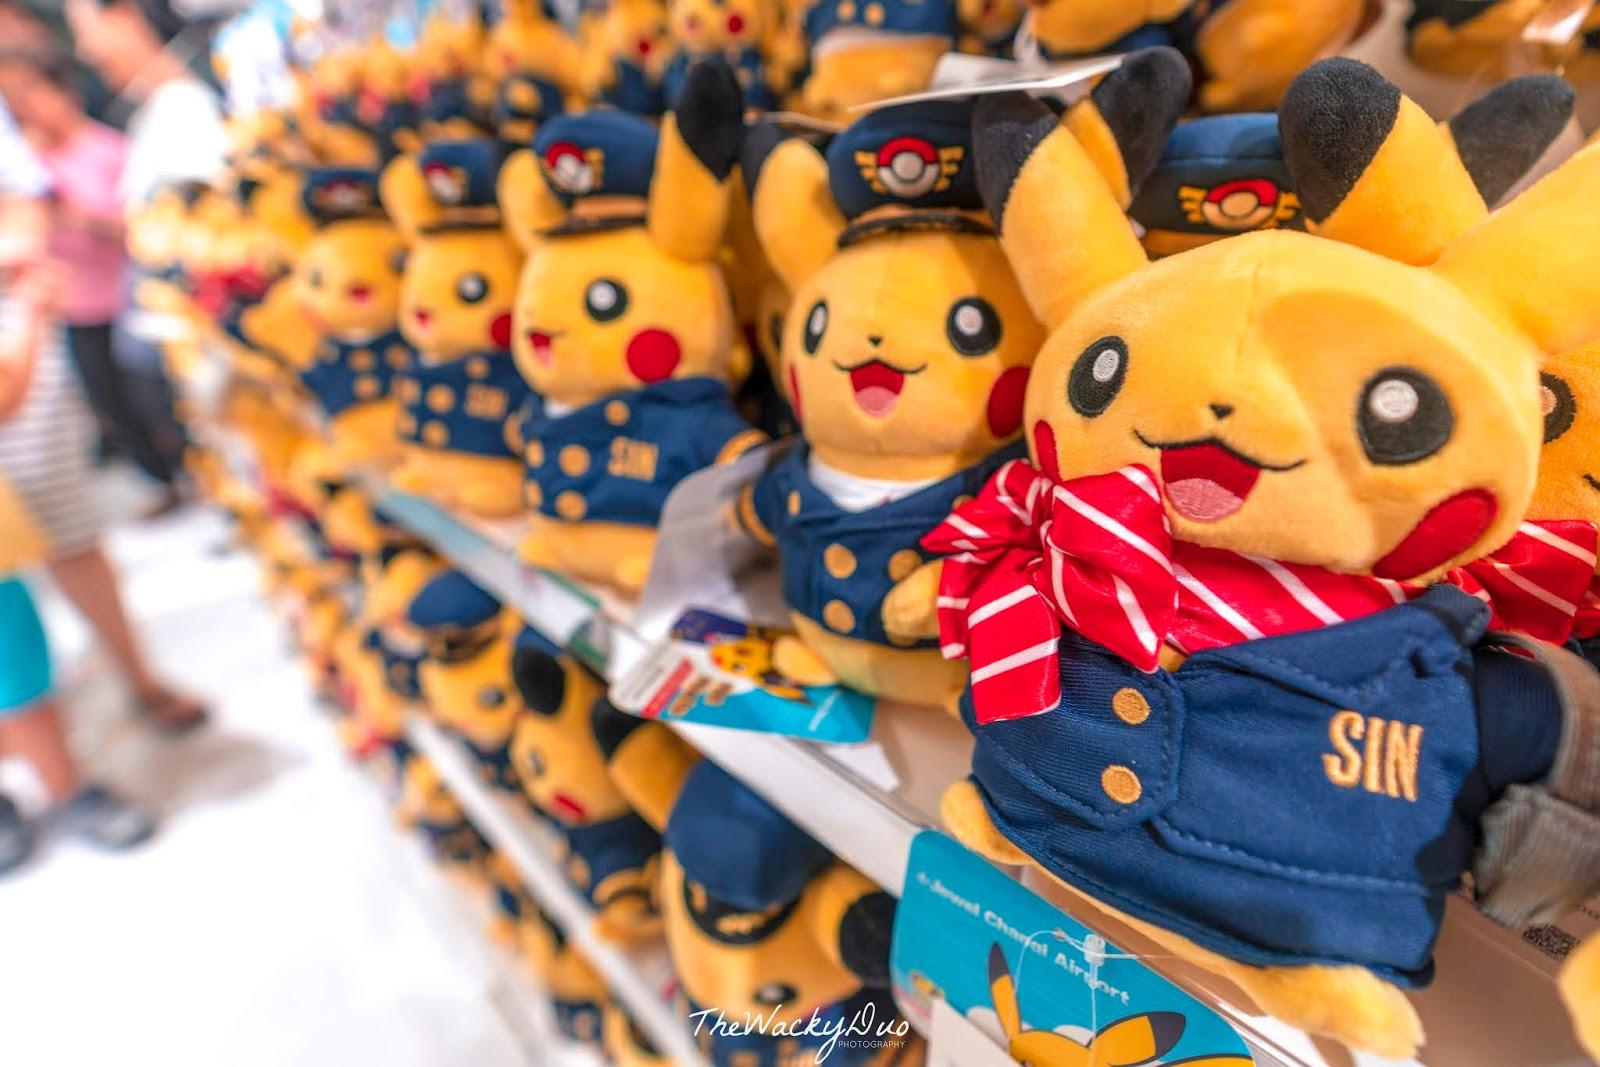 Pokemon Center @ Jewel Changi Airport Review - 5 Must buy